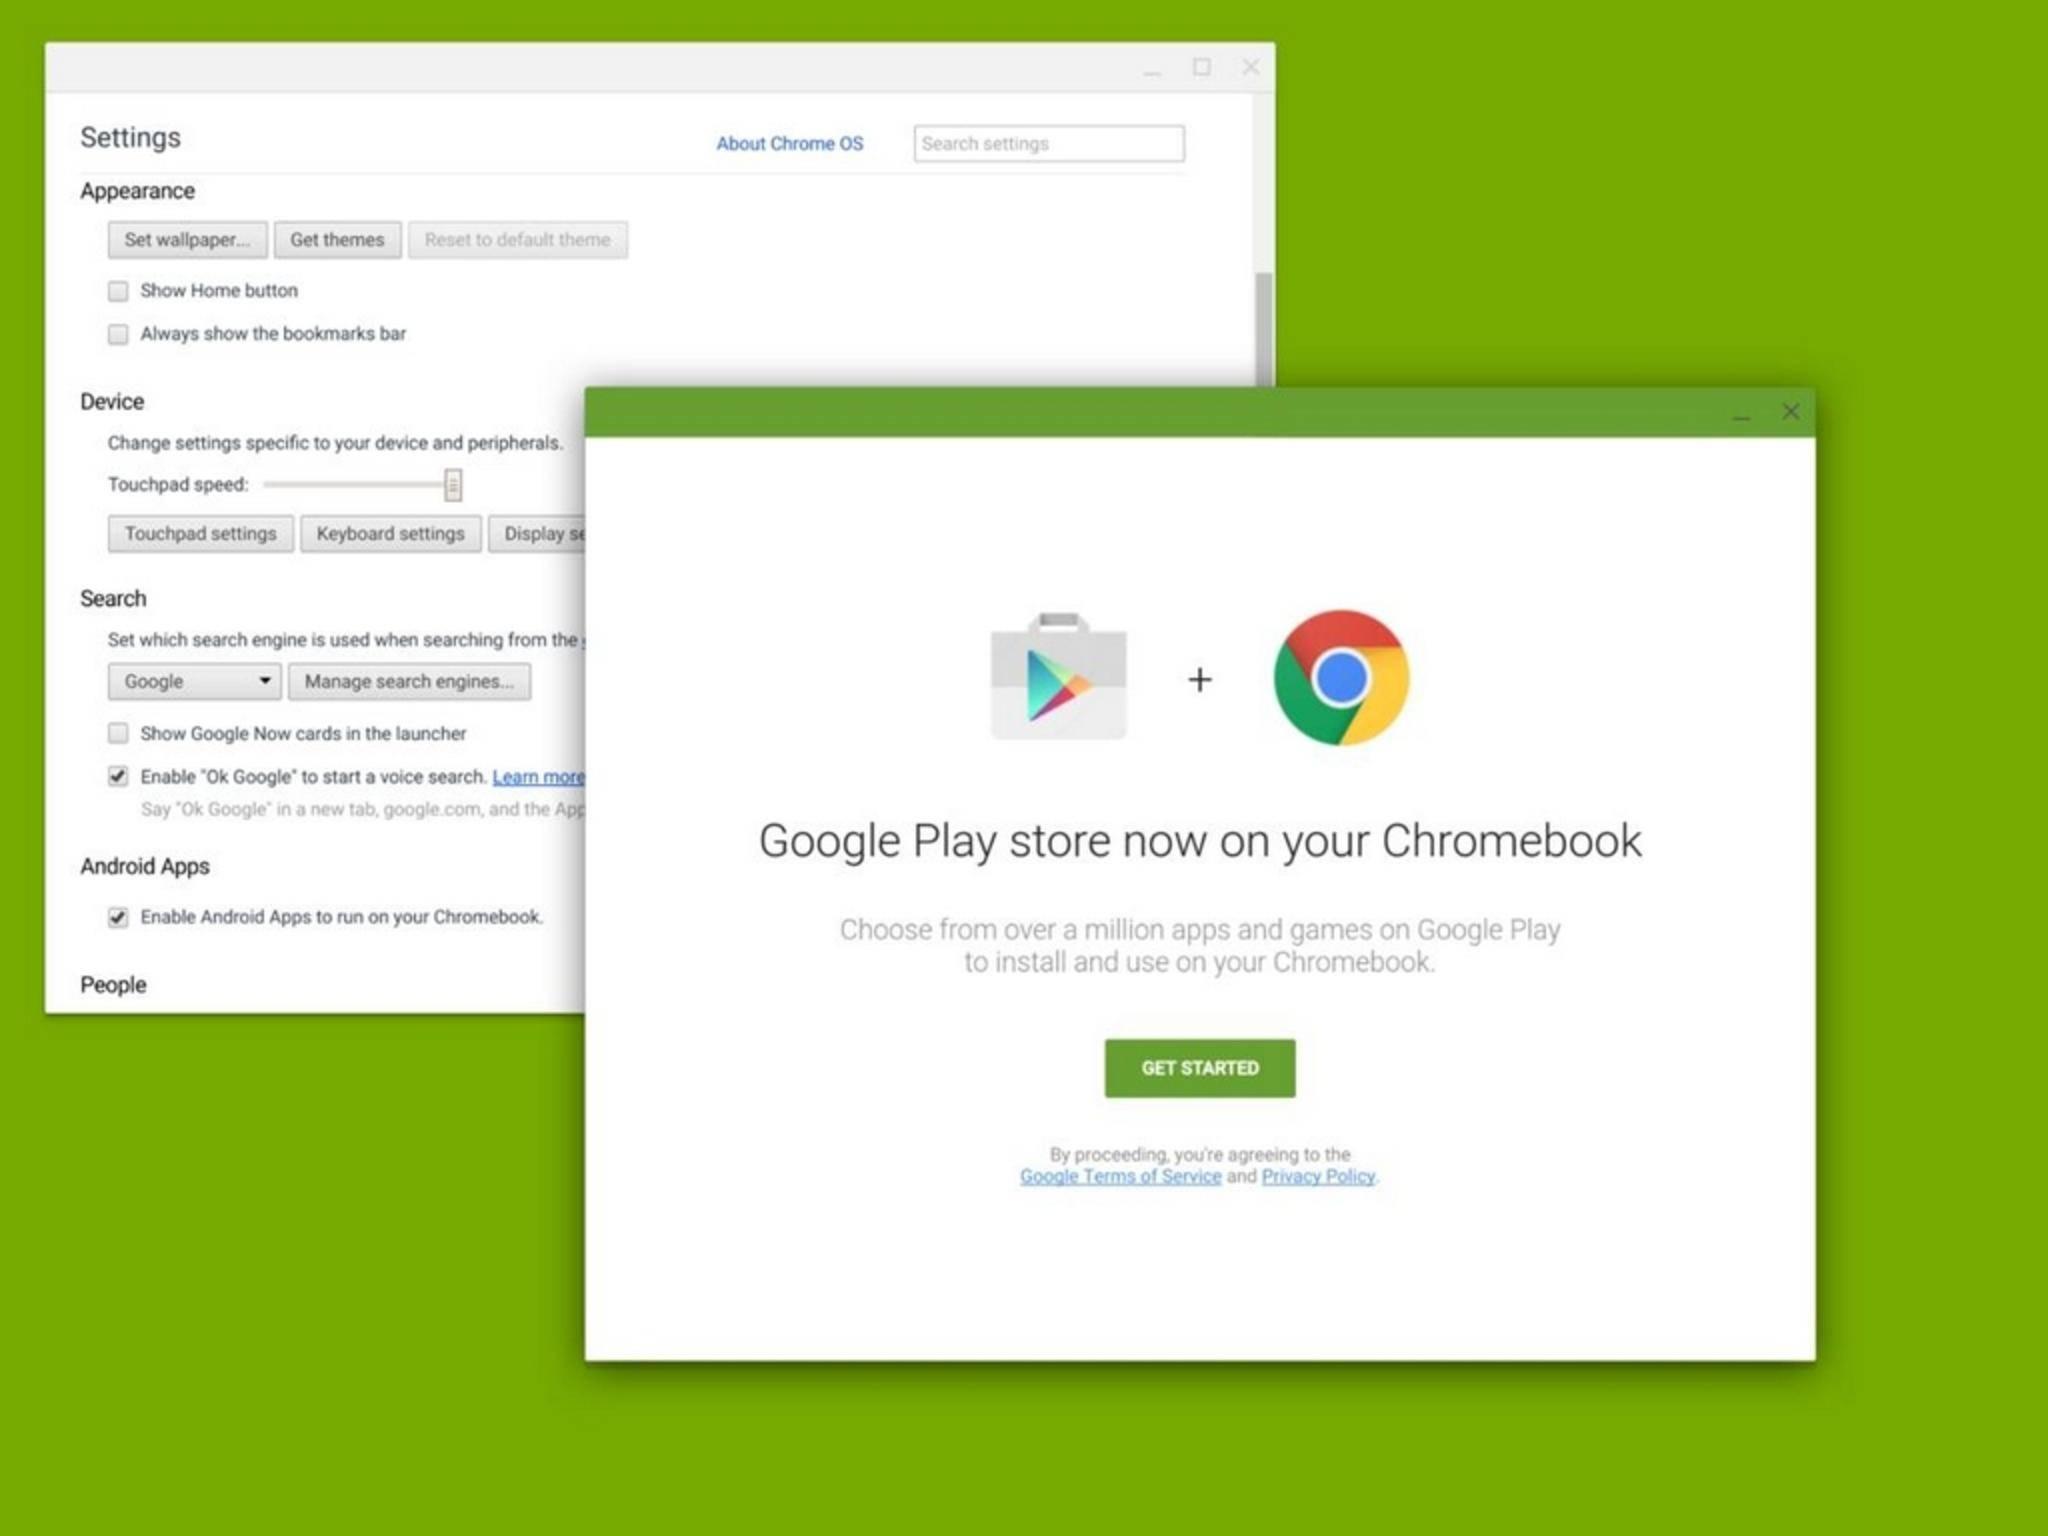 Der Google Play Store kommt offenbar für Chrome OS.